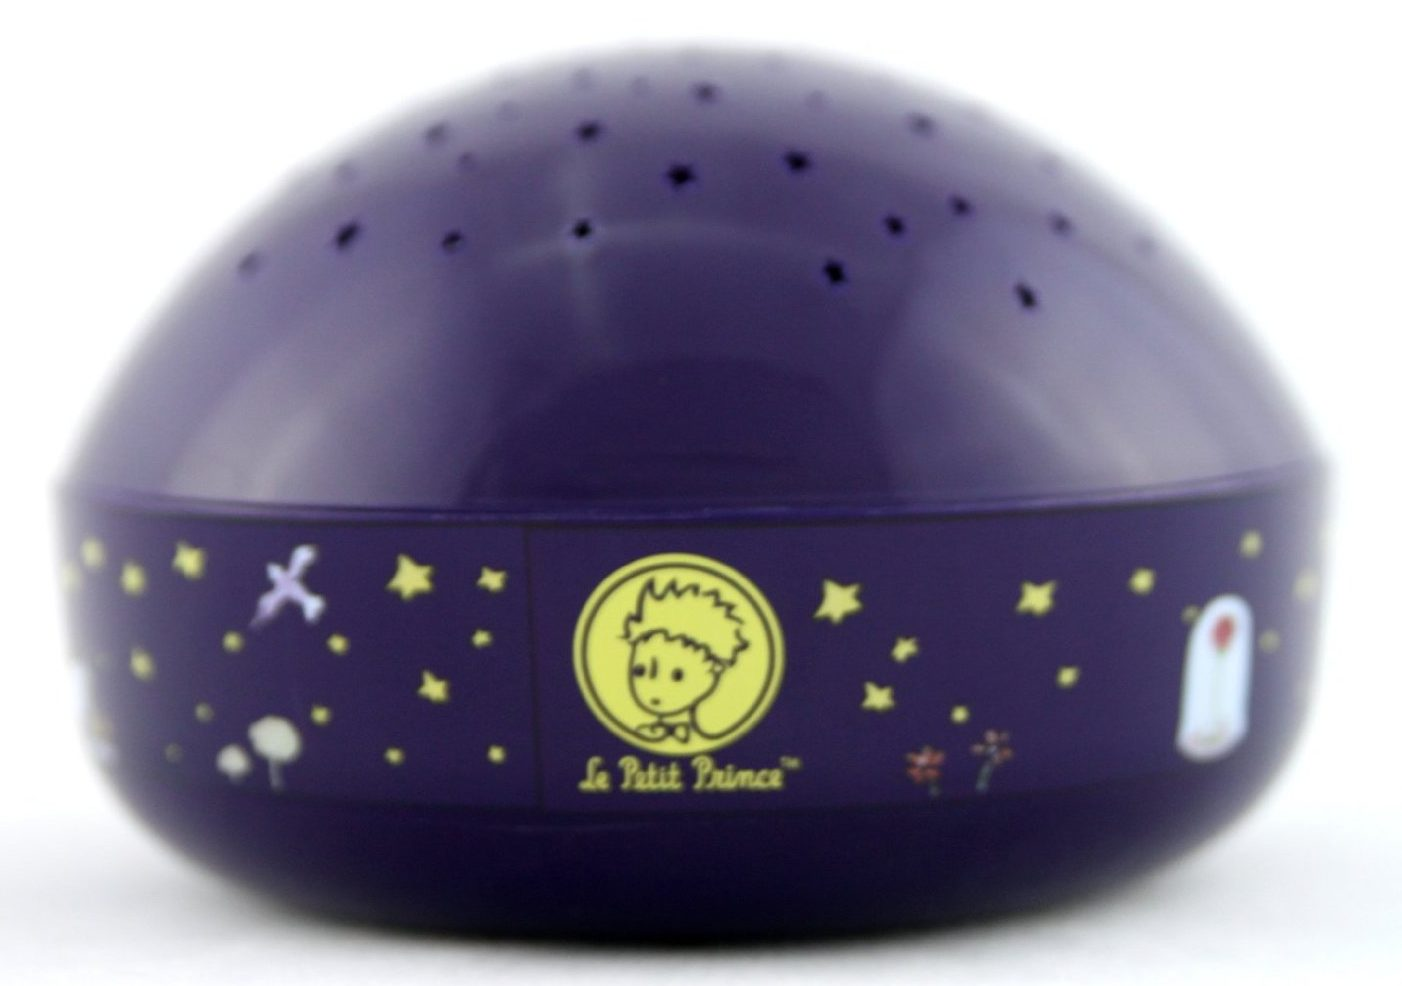 Le Petit Prince Star Projector